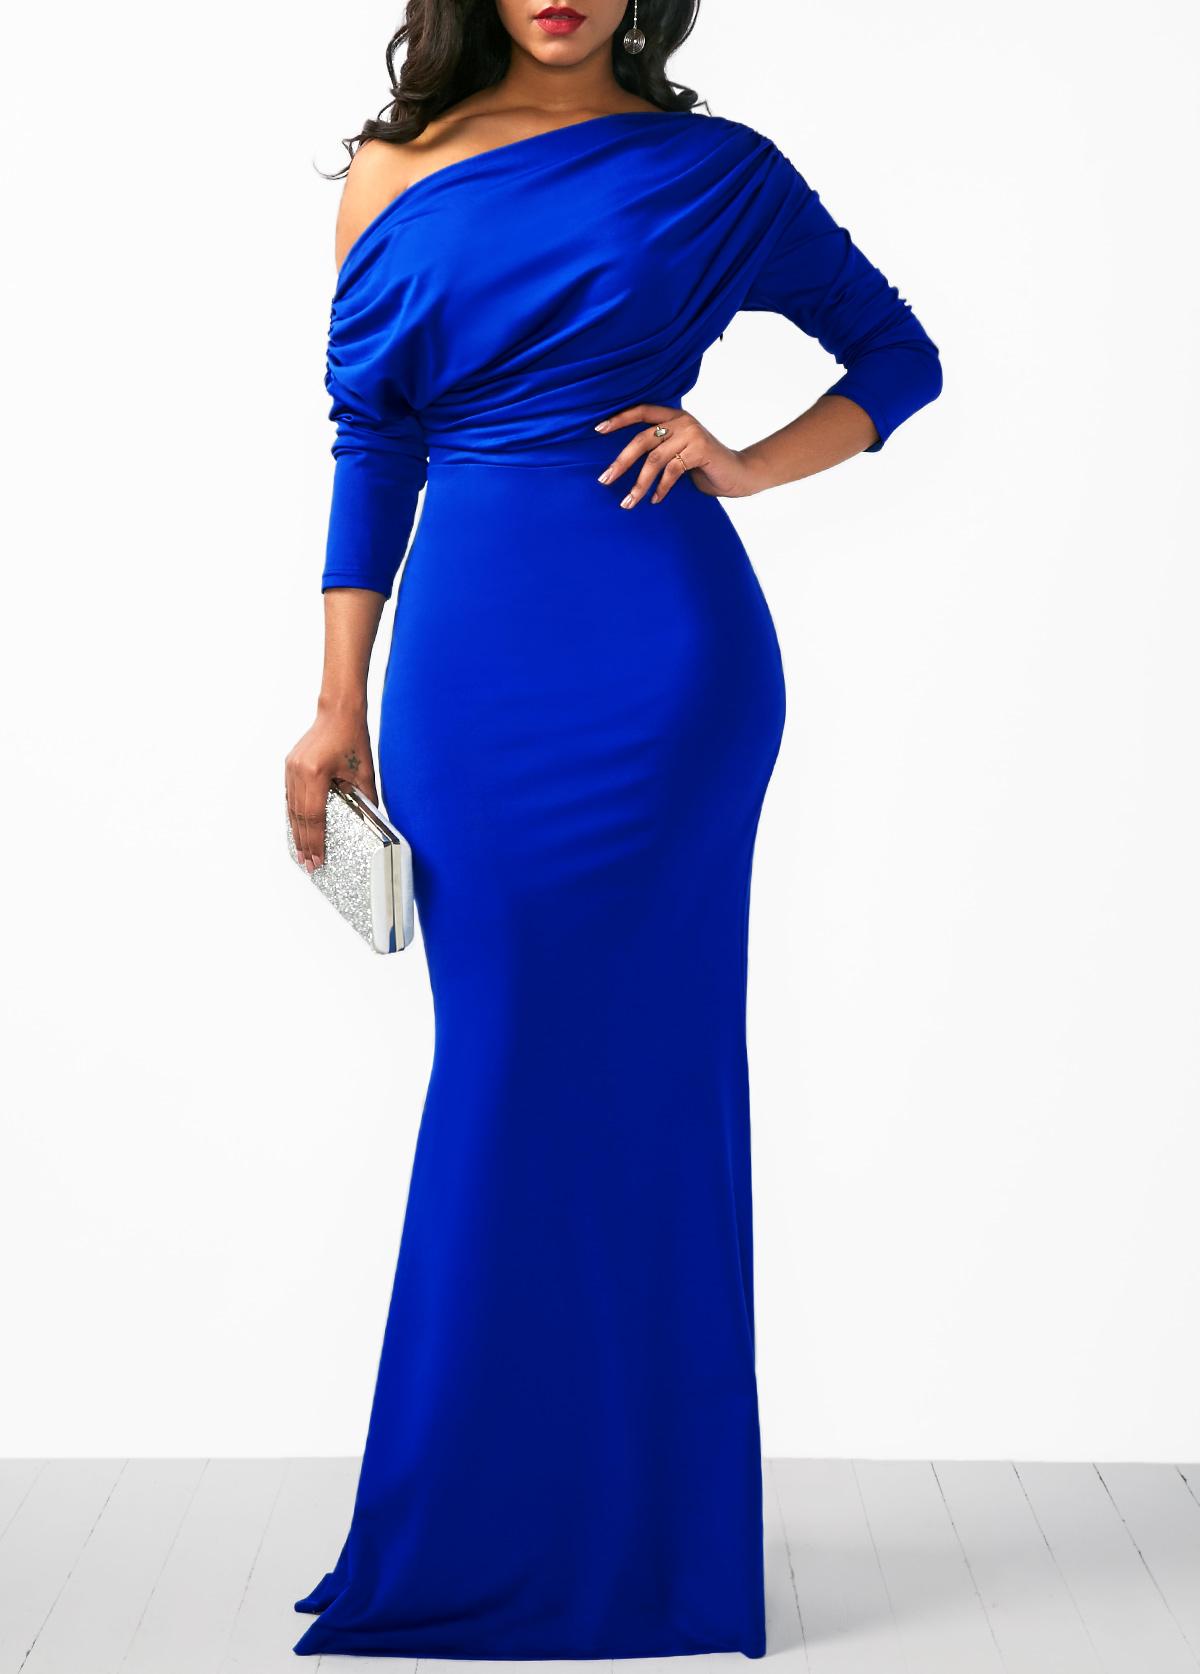 blue dresses three quarter sleeve blue mermaid dress SVXSVRY